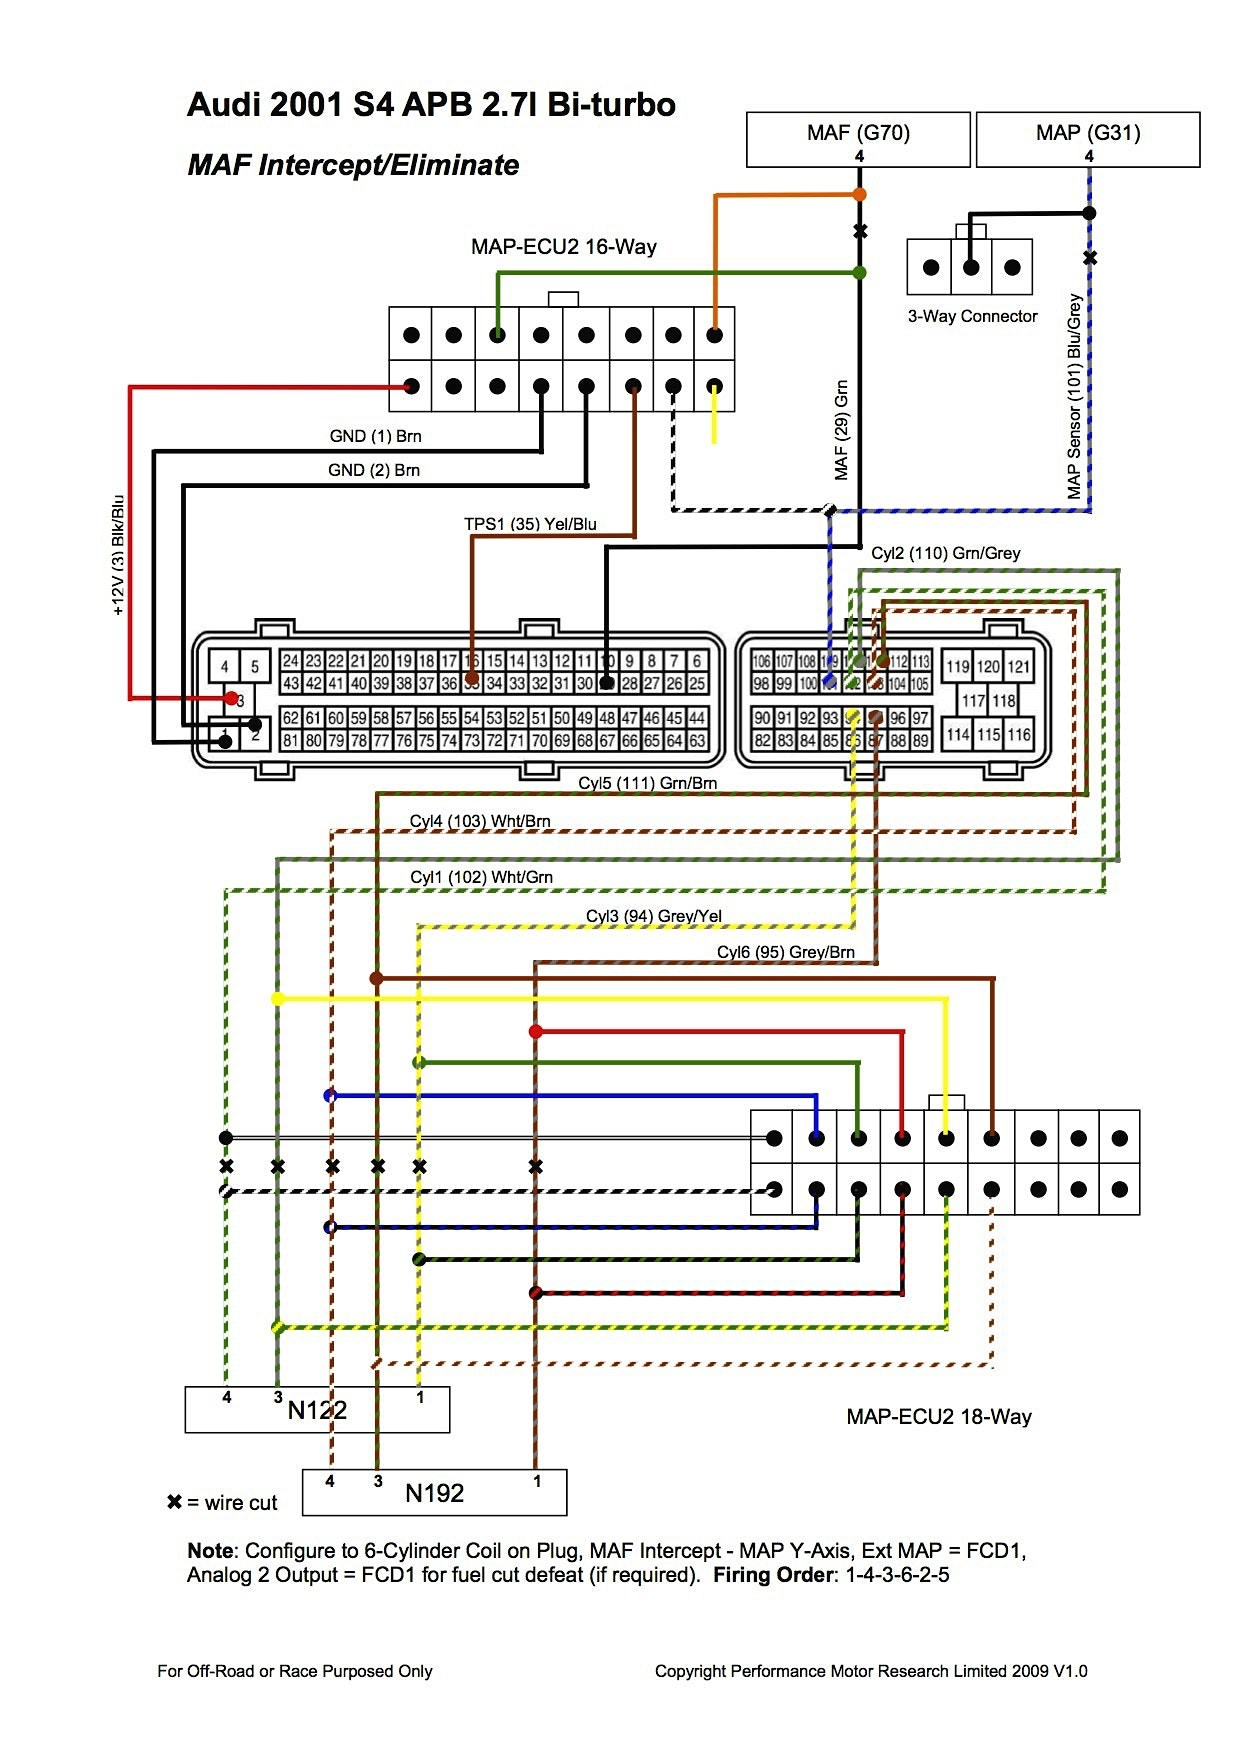 2000 vw cabrio radio wiring diagrams throughout jetta diagram png